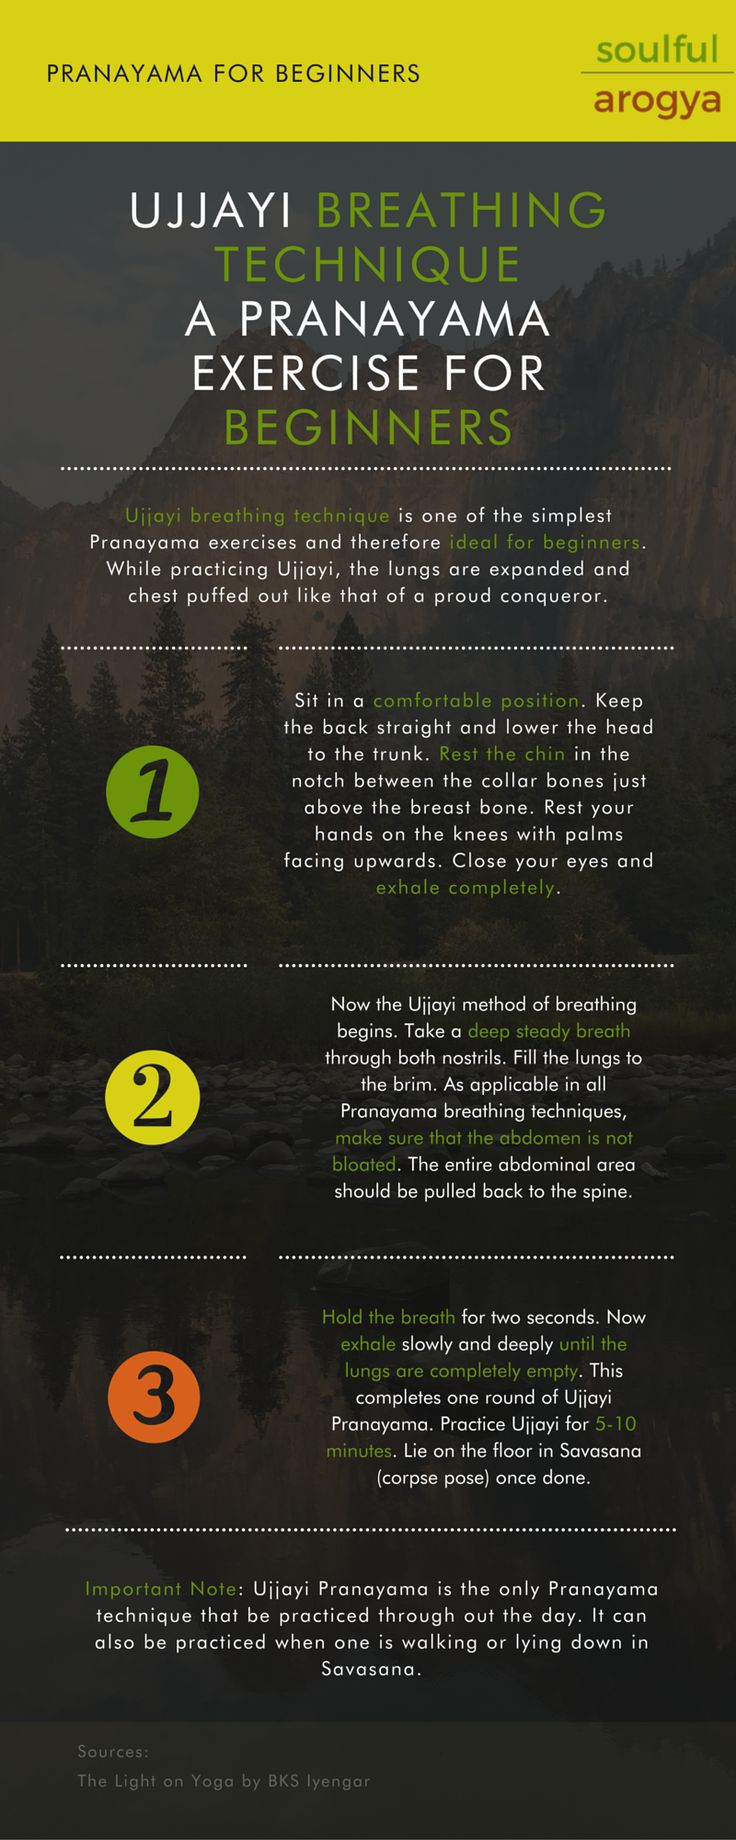 Ujjayi Pranayama: How to Master the Ancient Yoga Breathing Technique [Infographic]